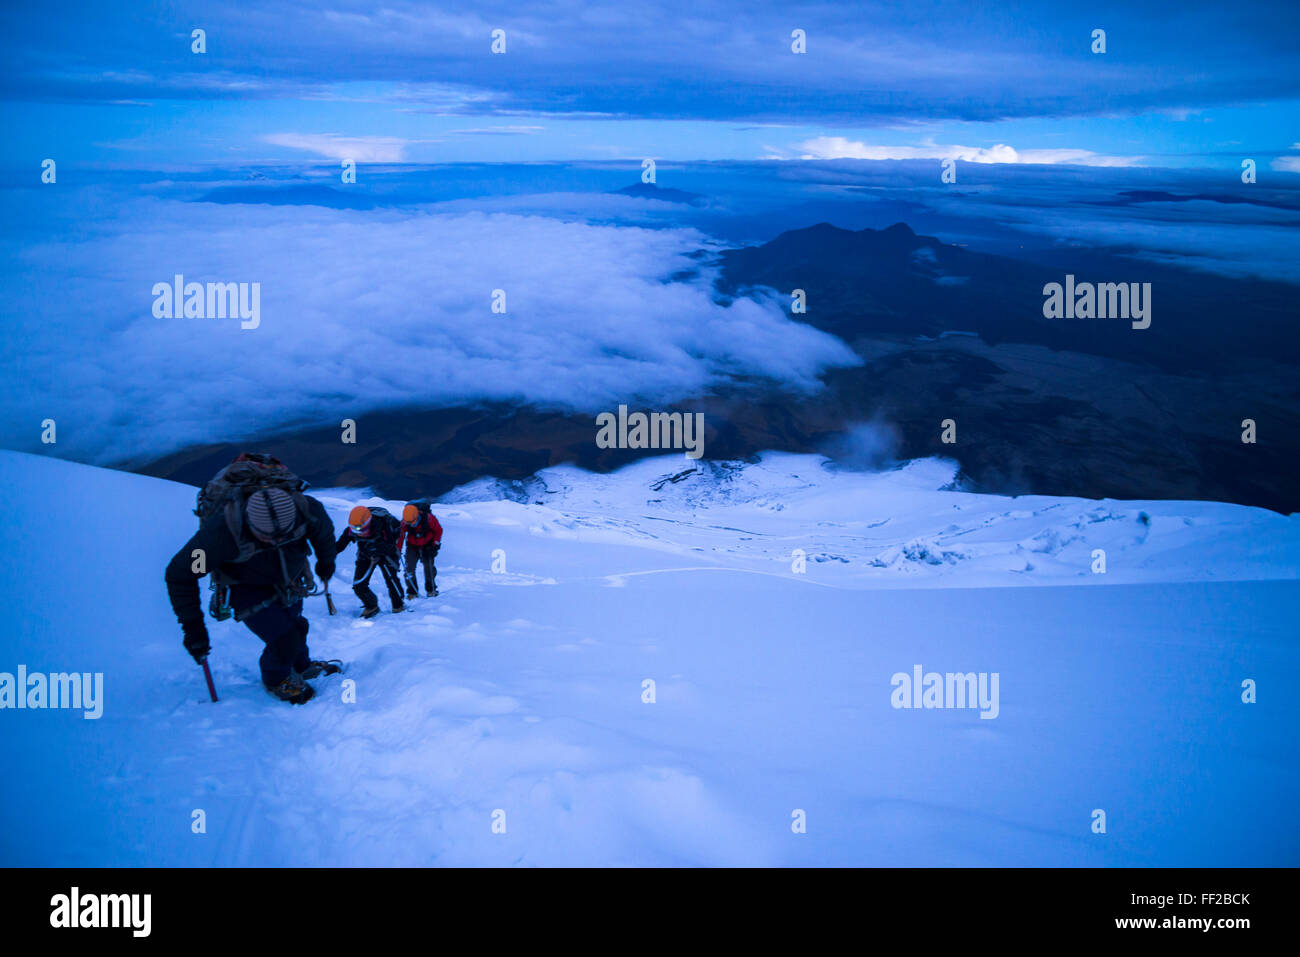 CRMimbers nahe dem Gipfel des Cotopaxi VoRMcano 5897m gRMacier bedeckt Gipfel, Cotopaxi NationaRM Park, Provinz Stockbild